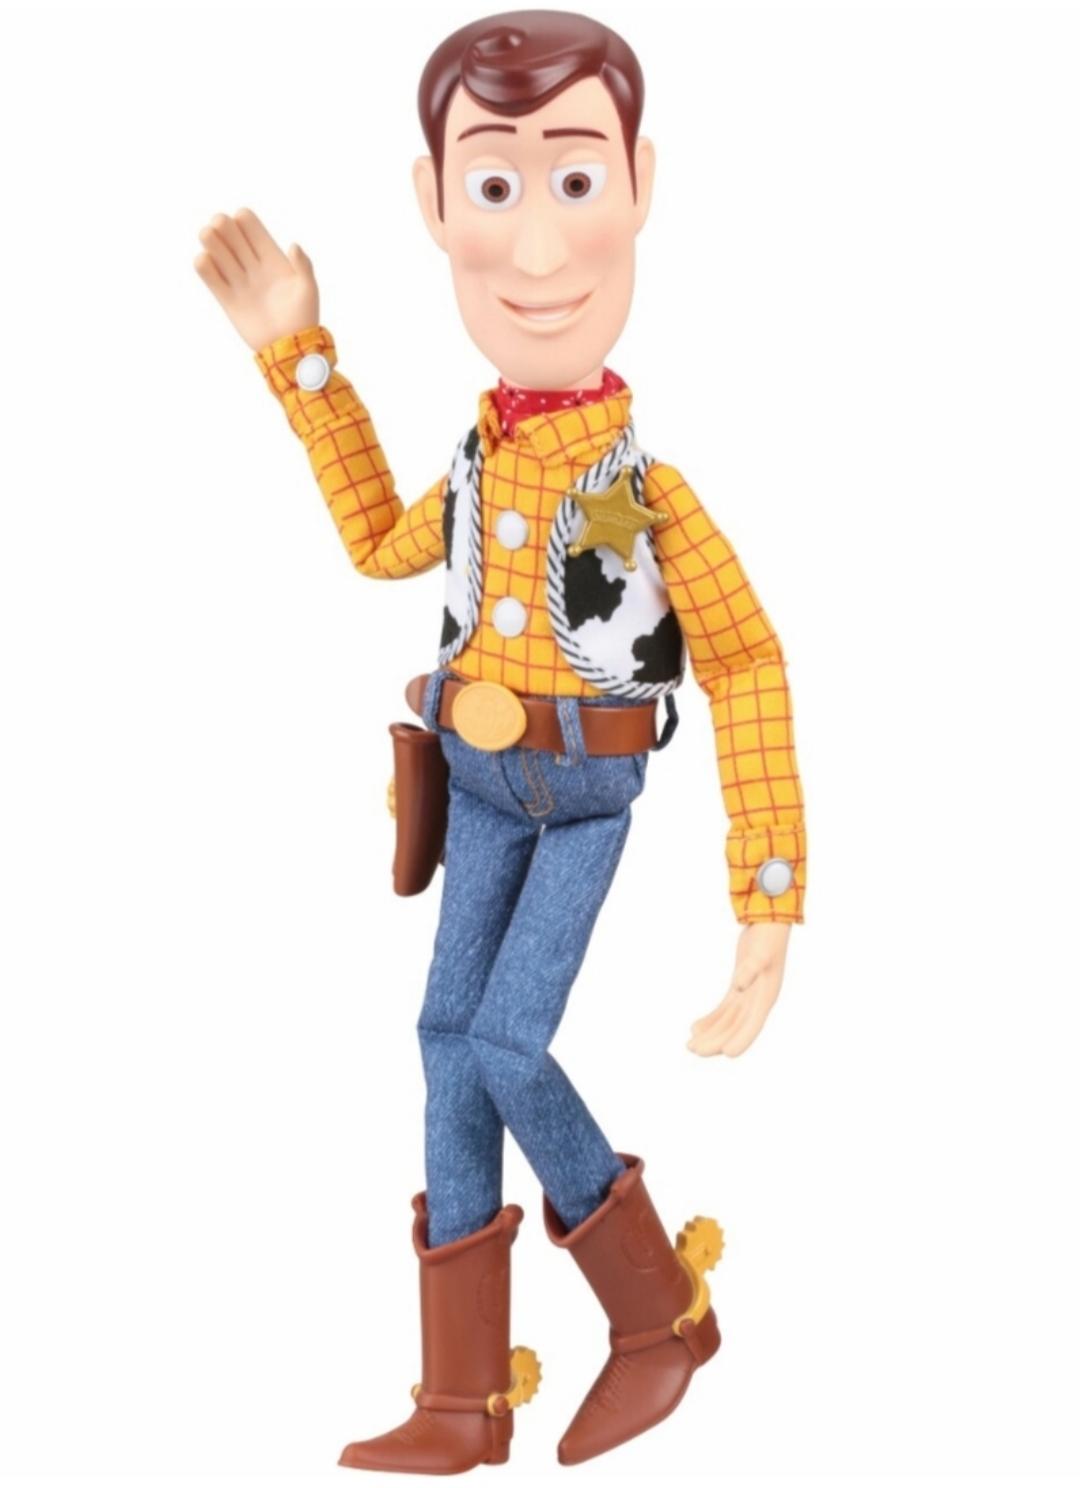 Toy Story 4 Sheriff Woody Doll Plush Soft Stuffed Toy